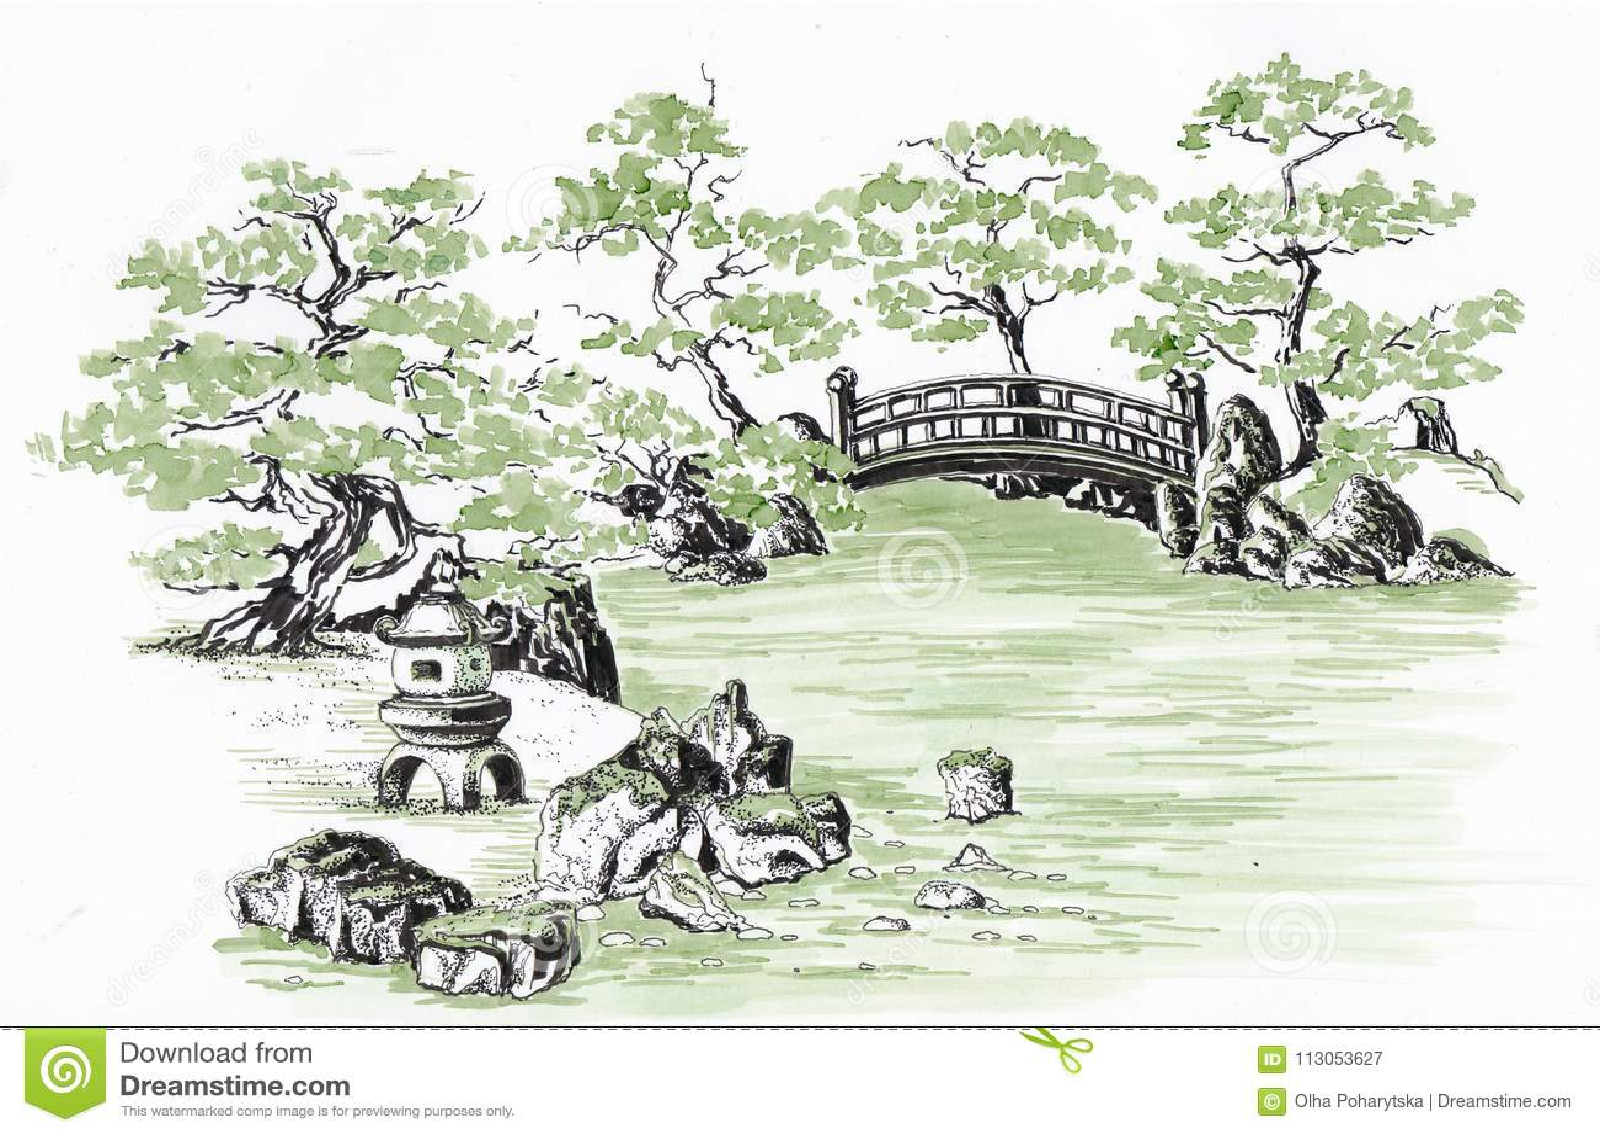 Download Japanese Garden Sketch Stock Illustration Of Nature